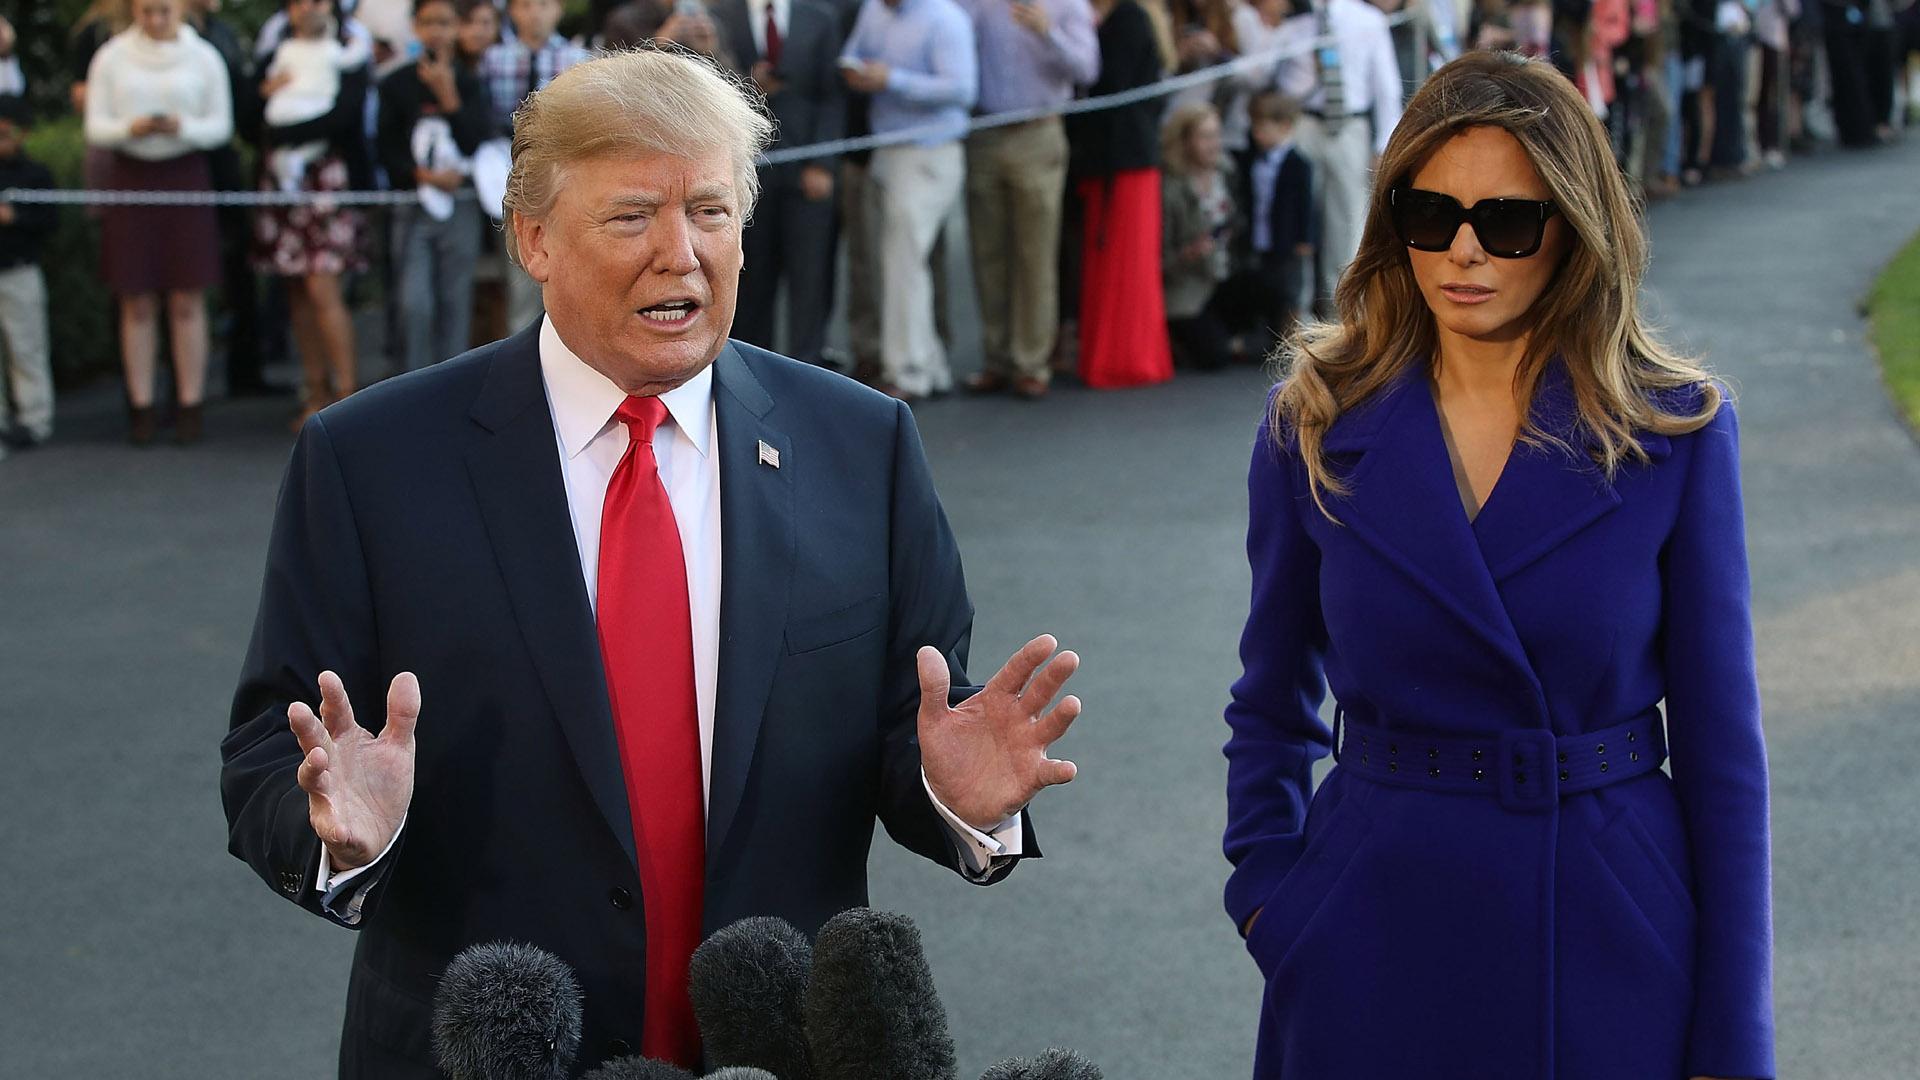 Donald Trump, Melania Trump  in DC, before departing to Asia46963378-159532